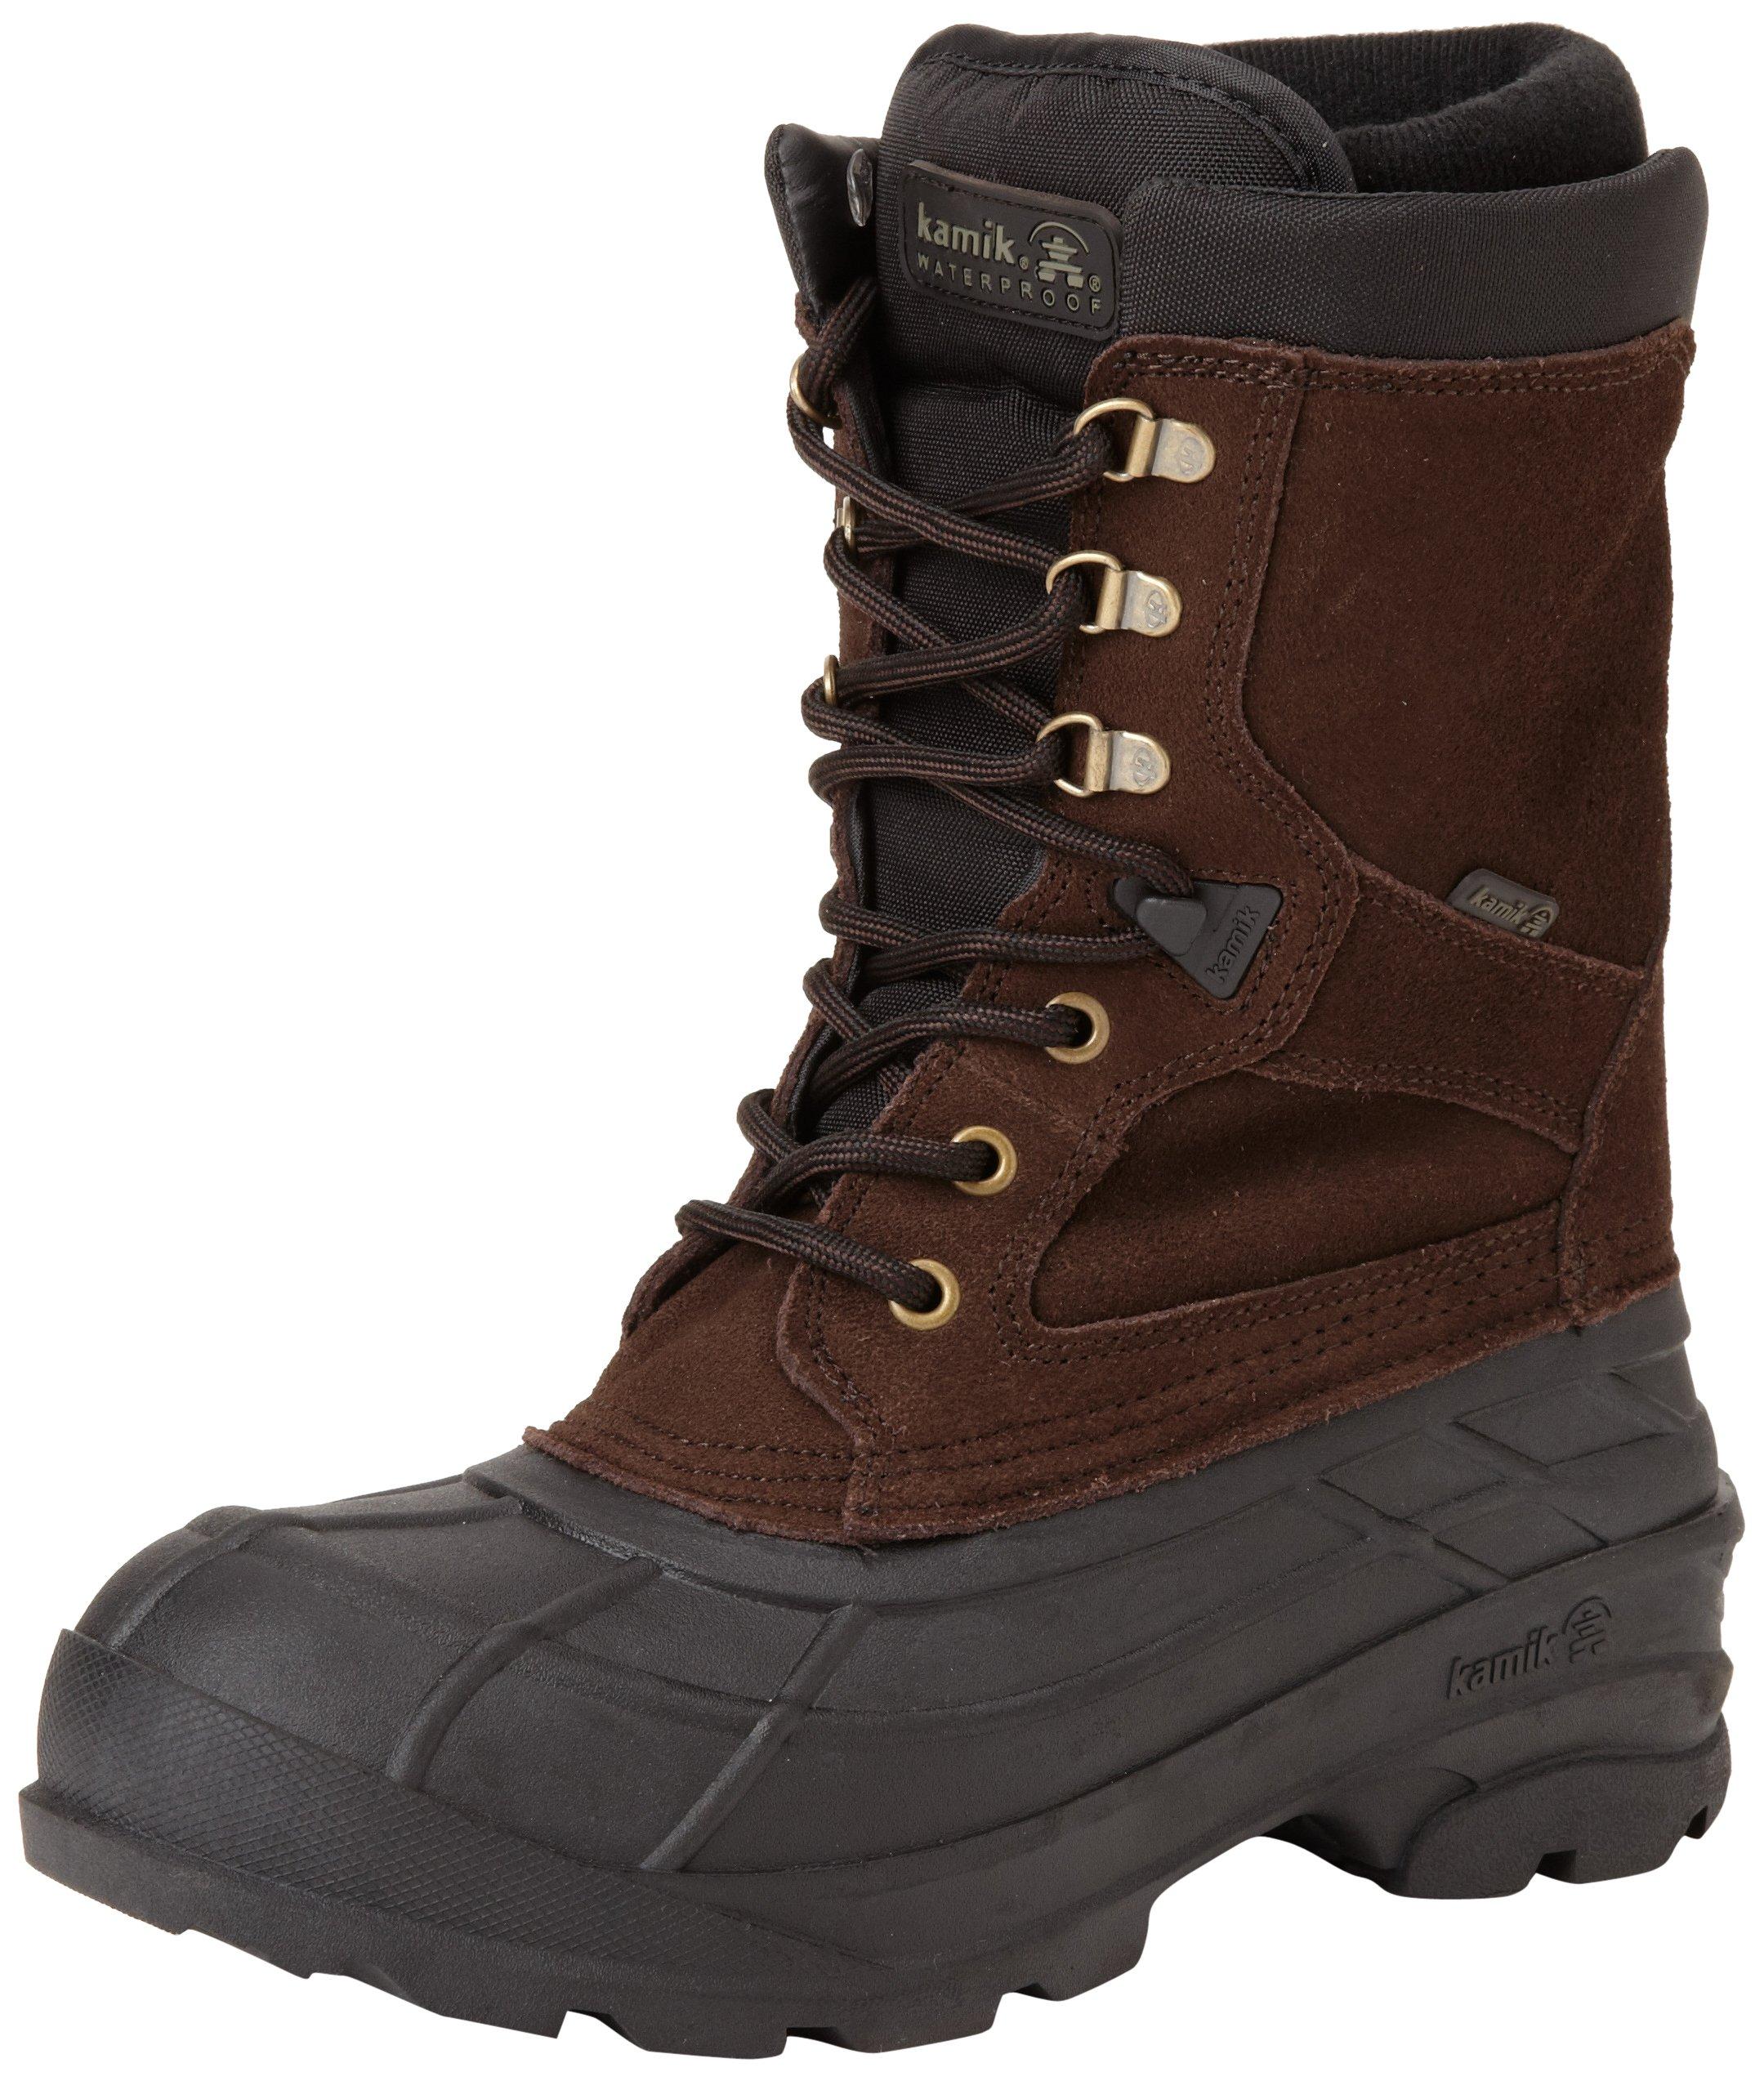 Kamik Men's Nationplus Snow Boot,Dark Brown,10 M US by Kamik